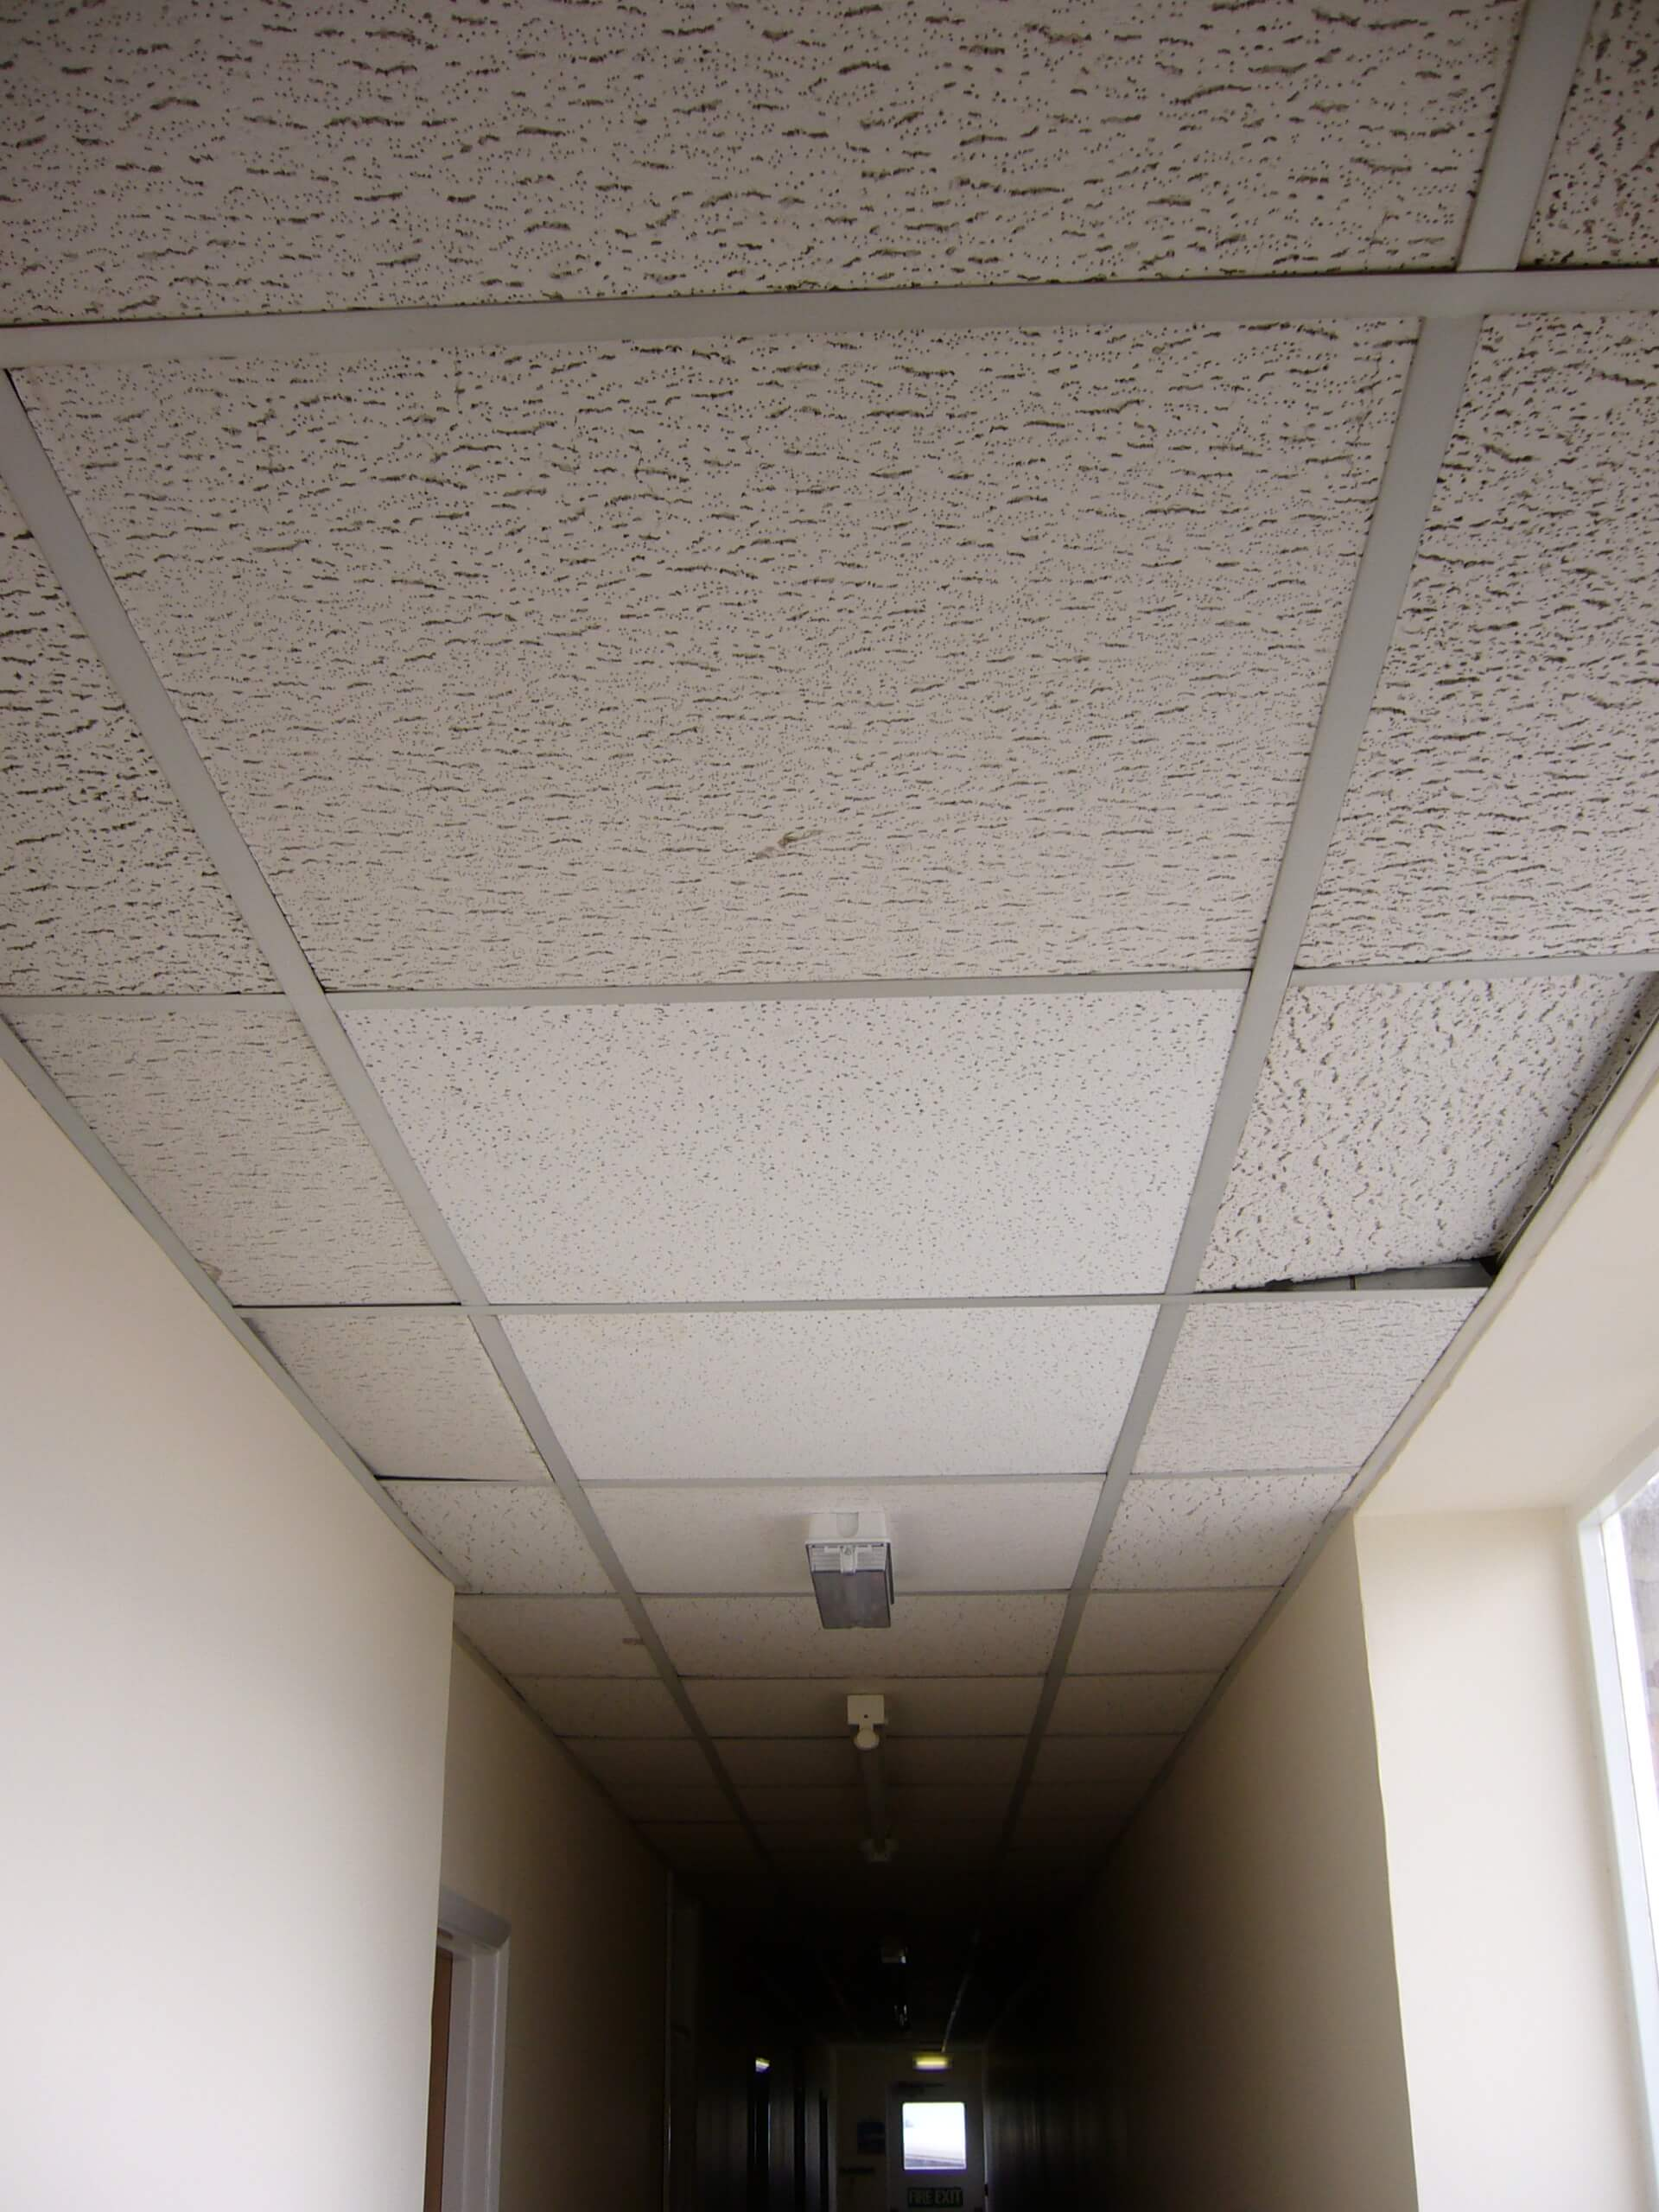 Suspended ceiling in Corsham, Wiltshire